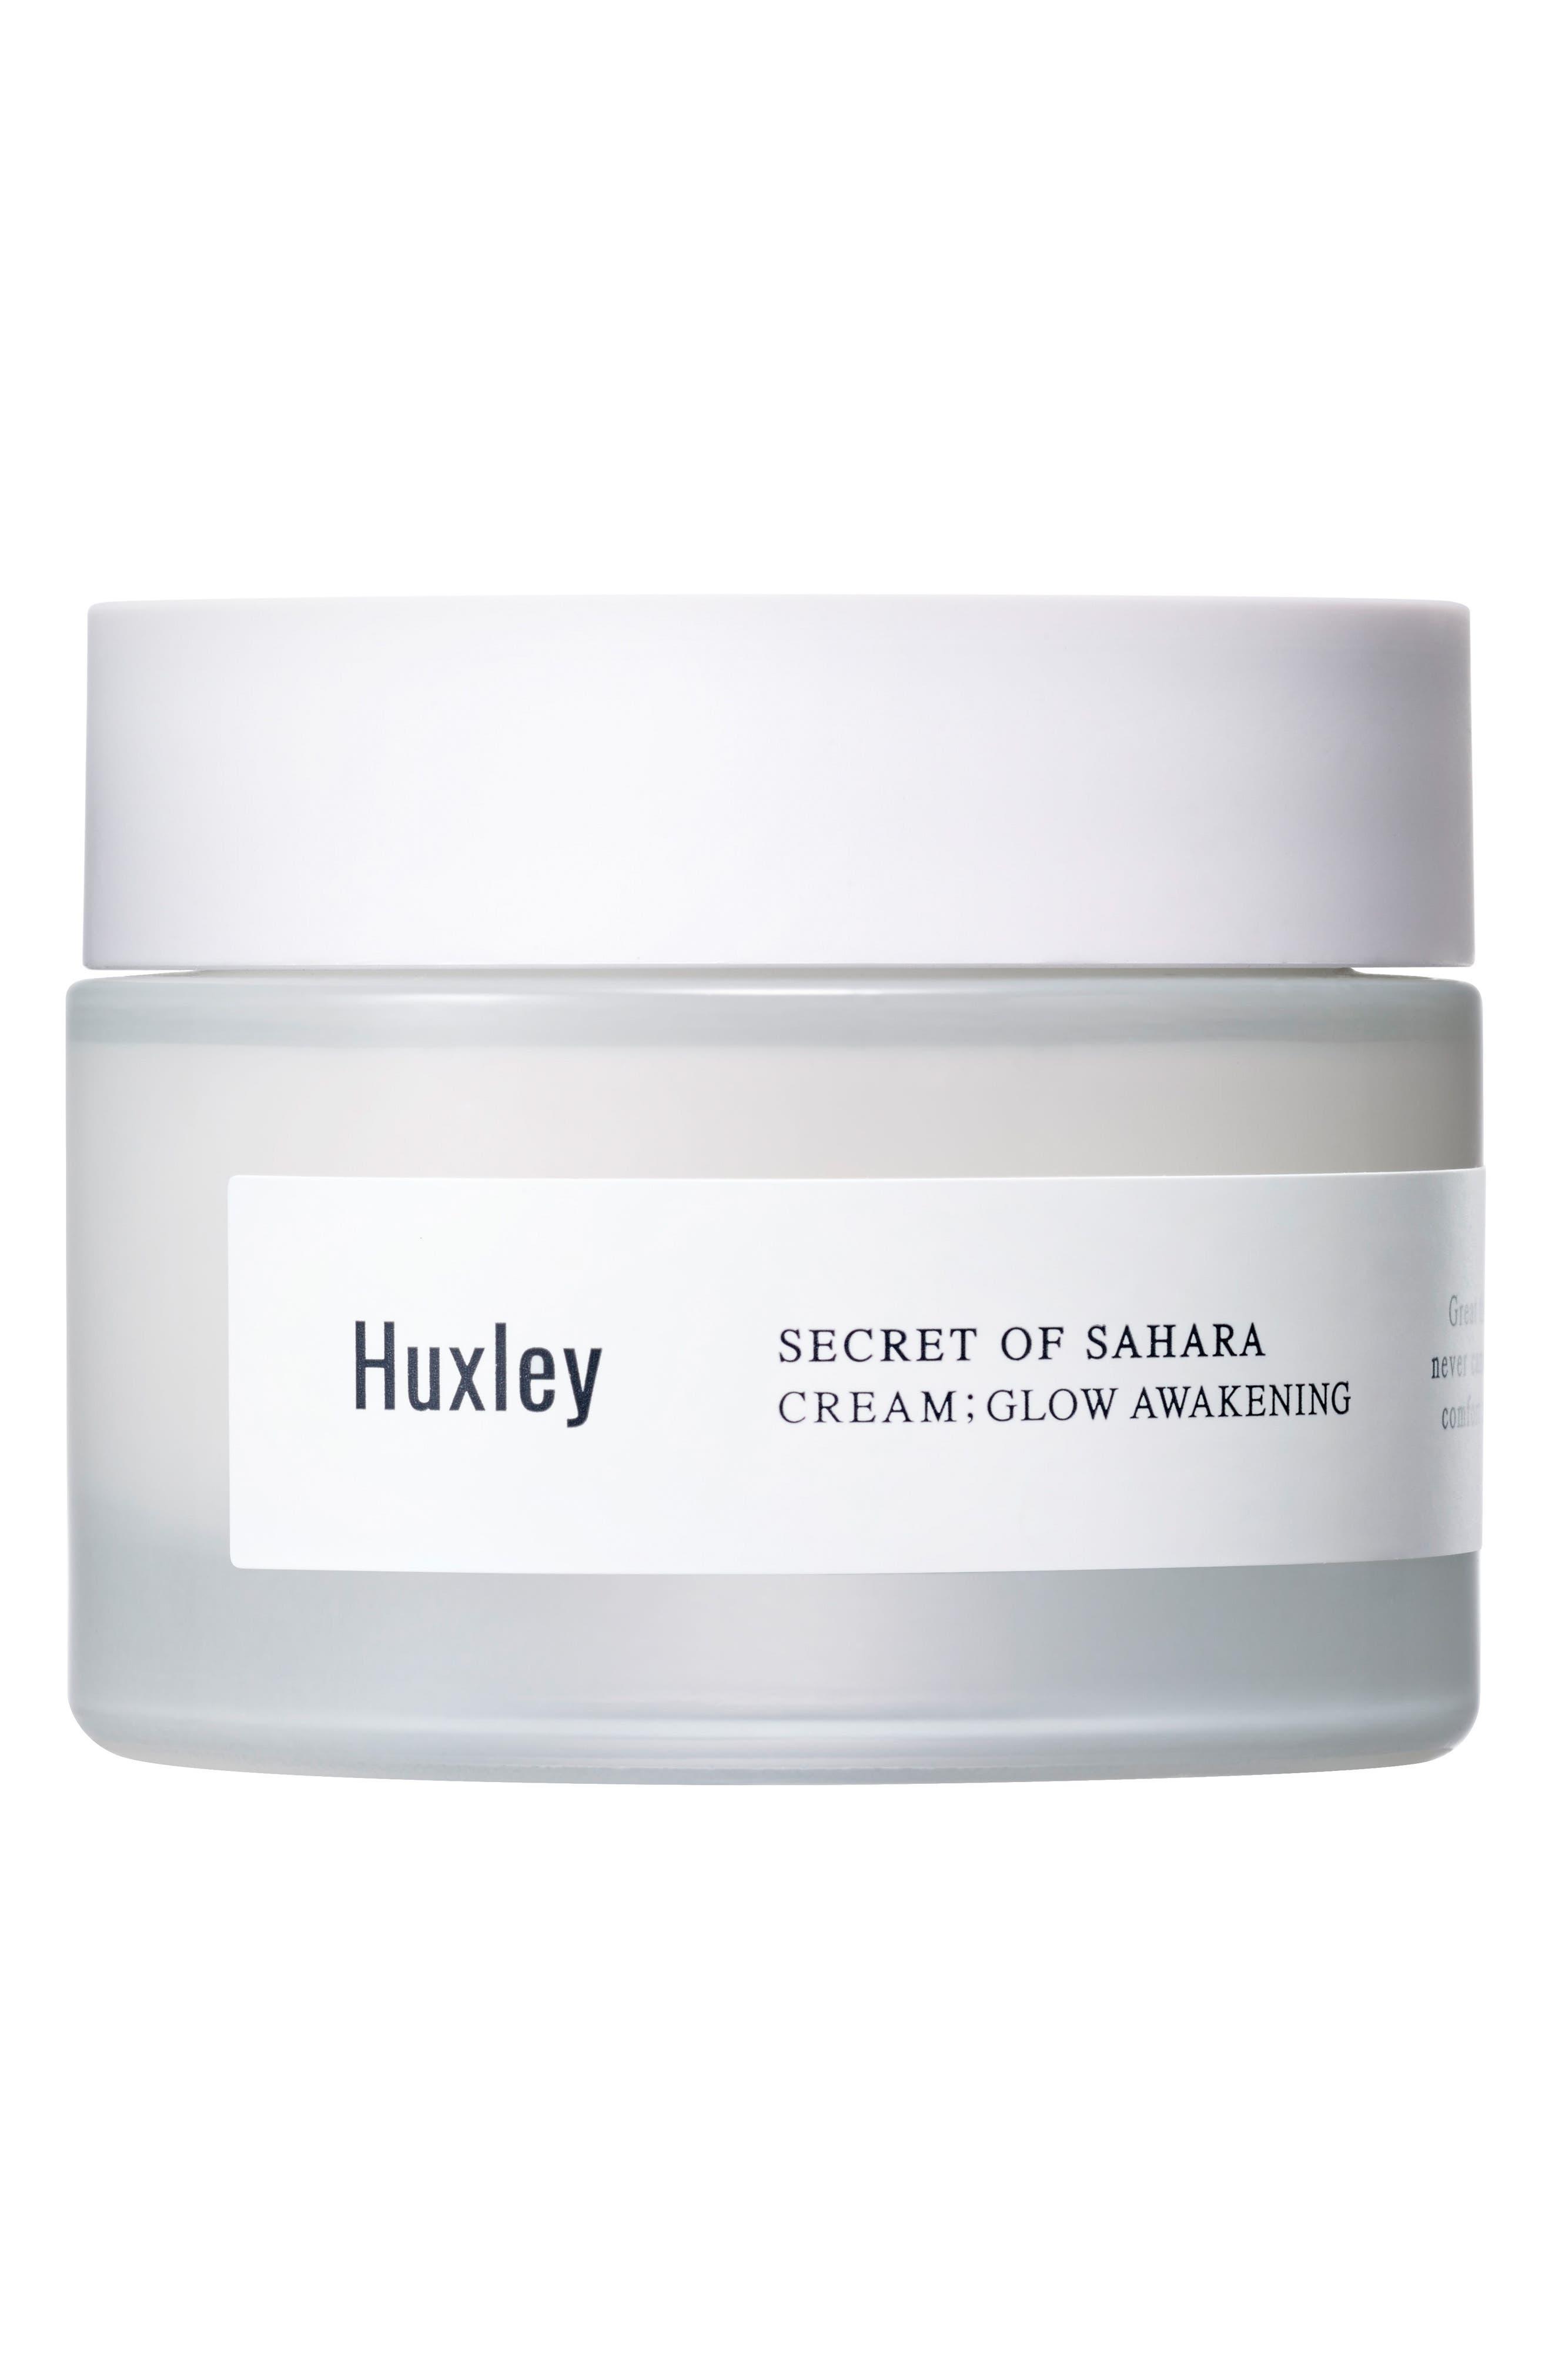 Alternate Image 1 Selected - Huxley Secret of Sahara Cream Glow Awakening